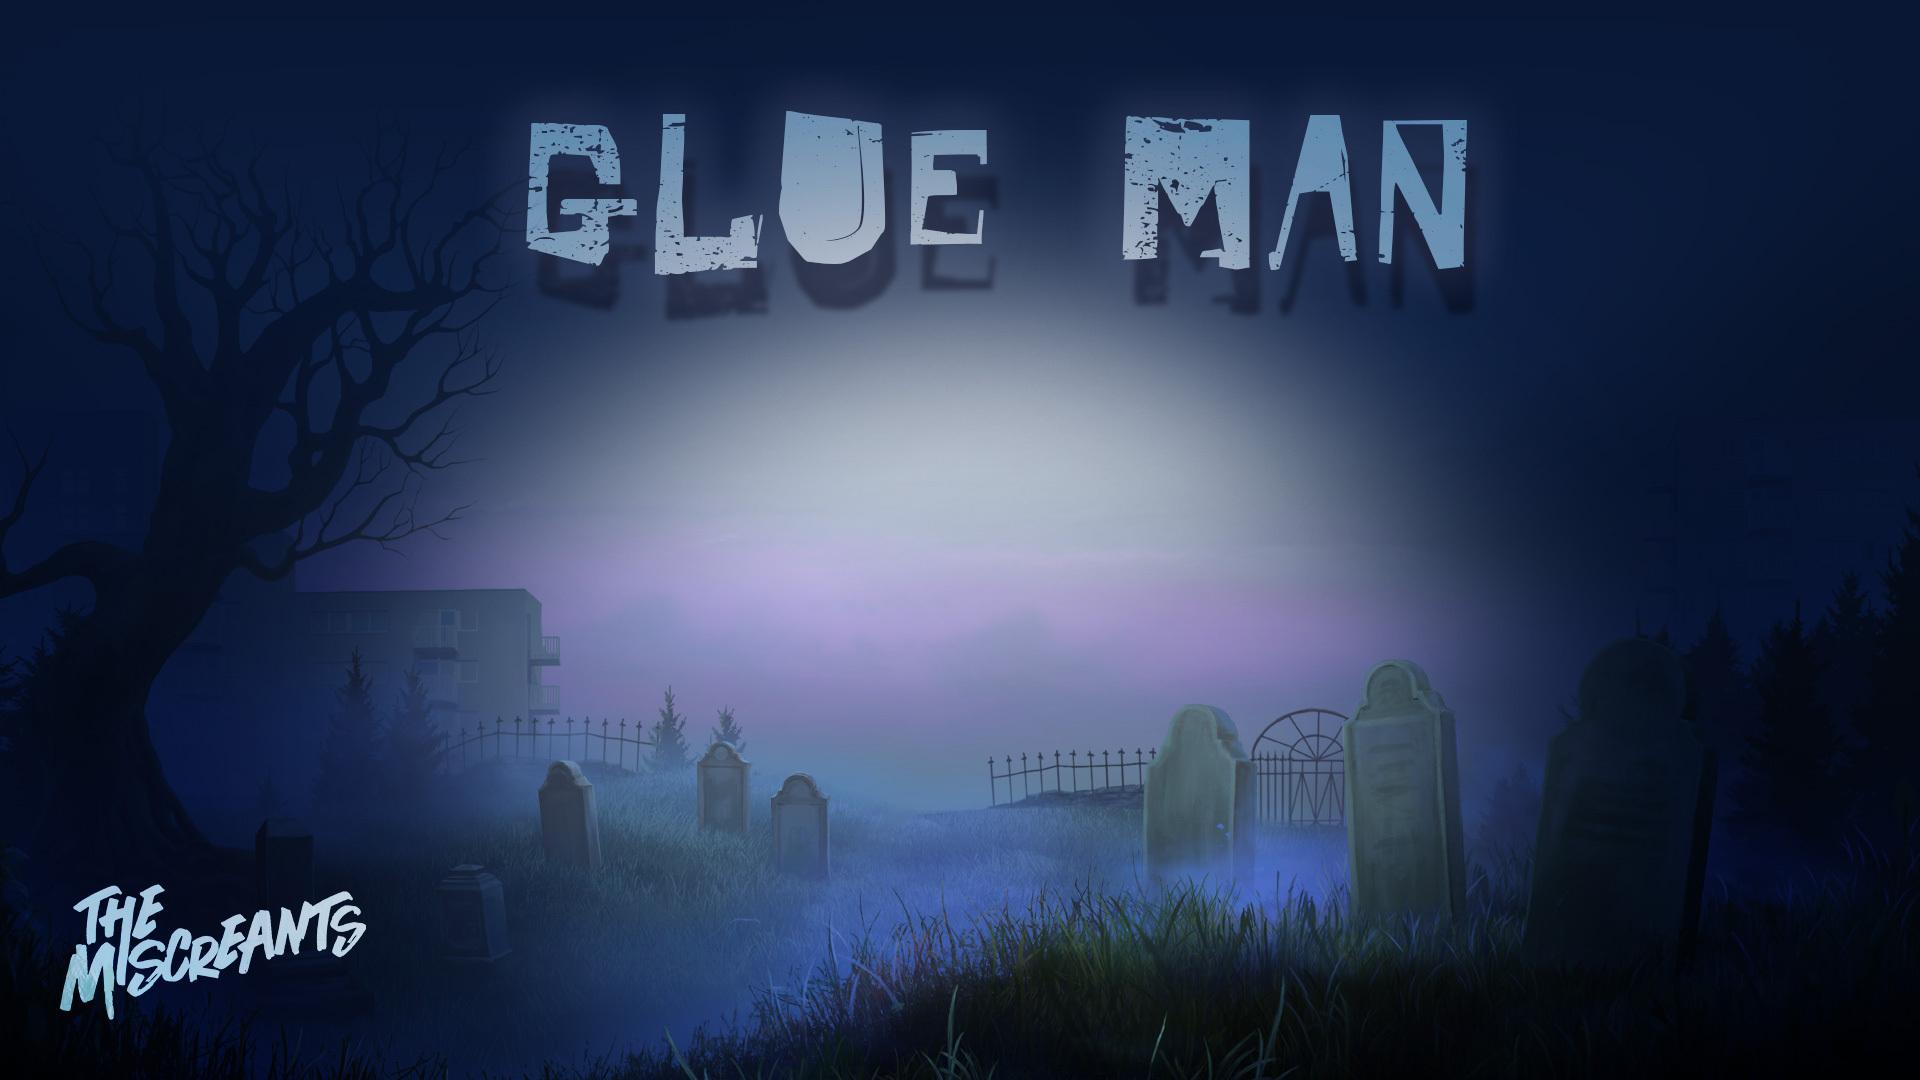 Glue Man - The Miscreants